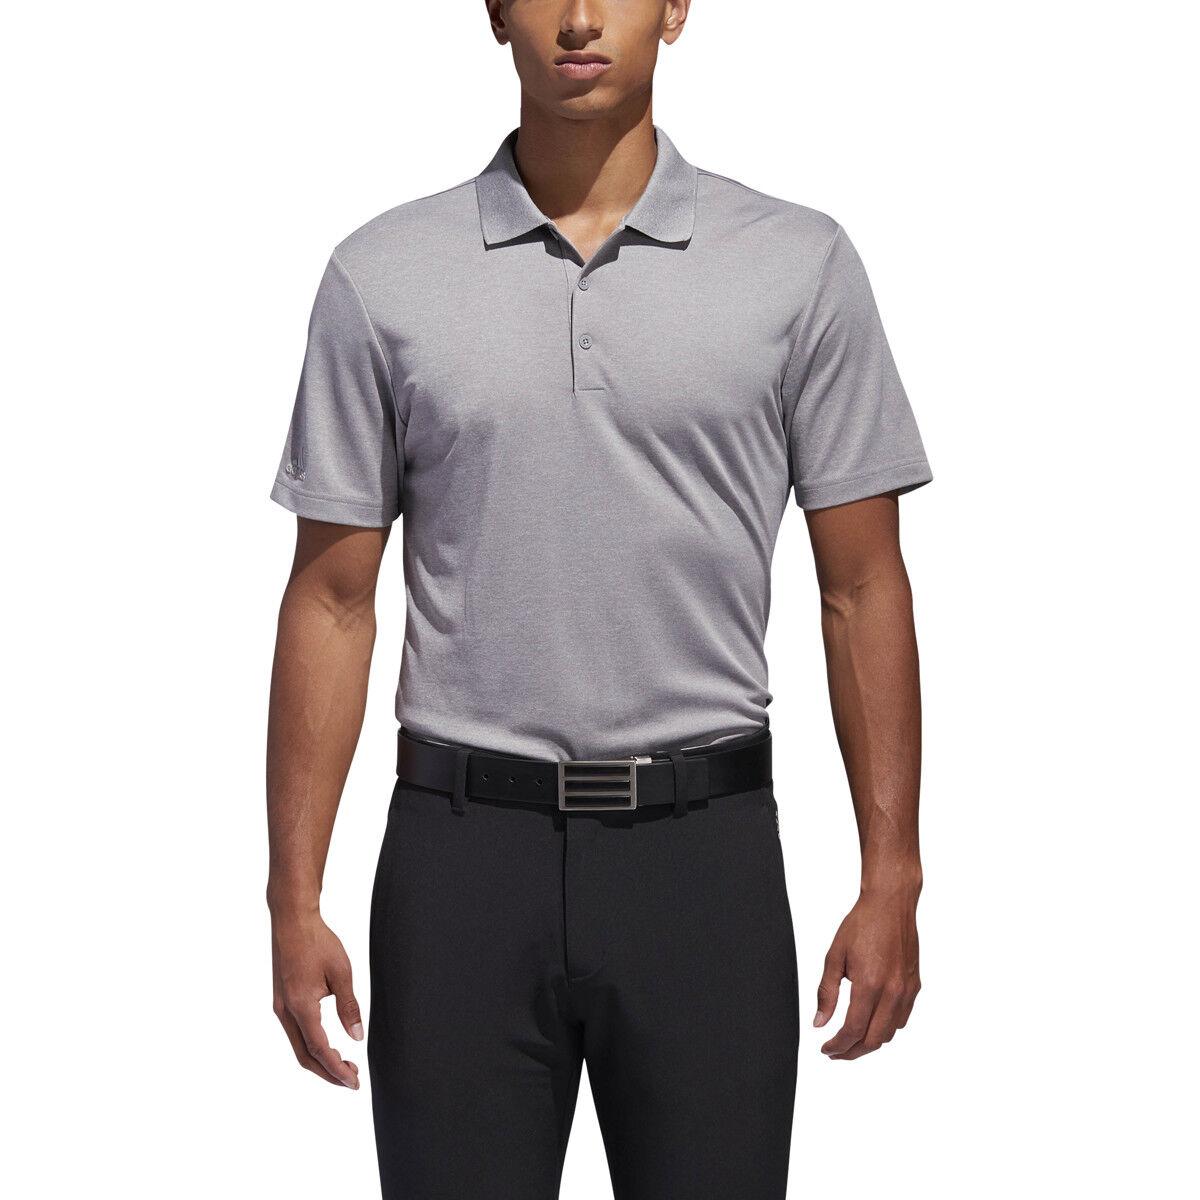 New 2018 Adidas Performance Golf Grey Heather Polo Shirt Medium (M)